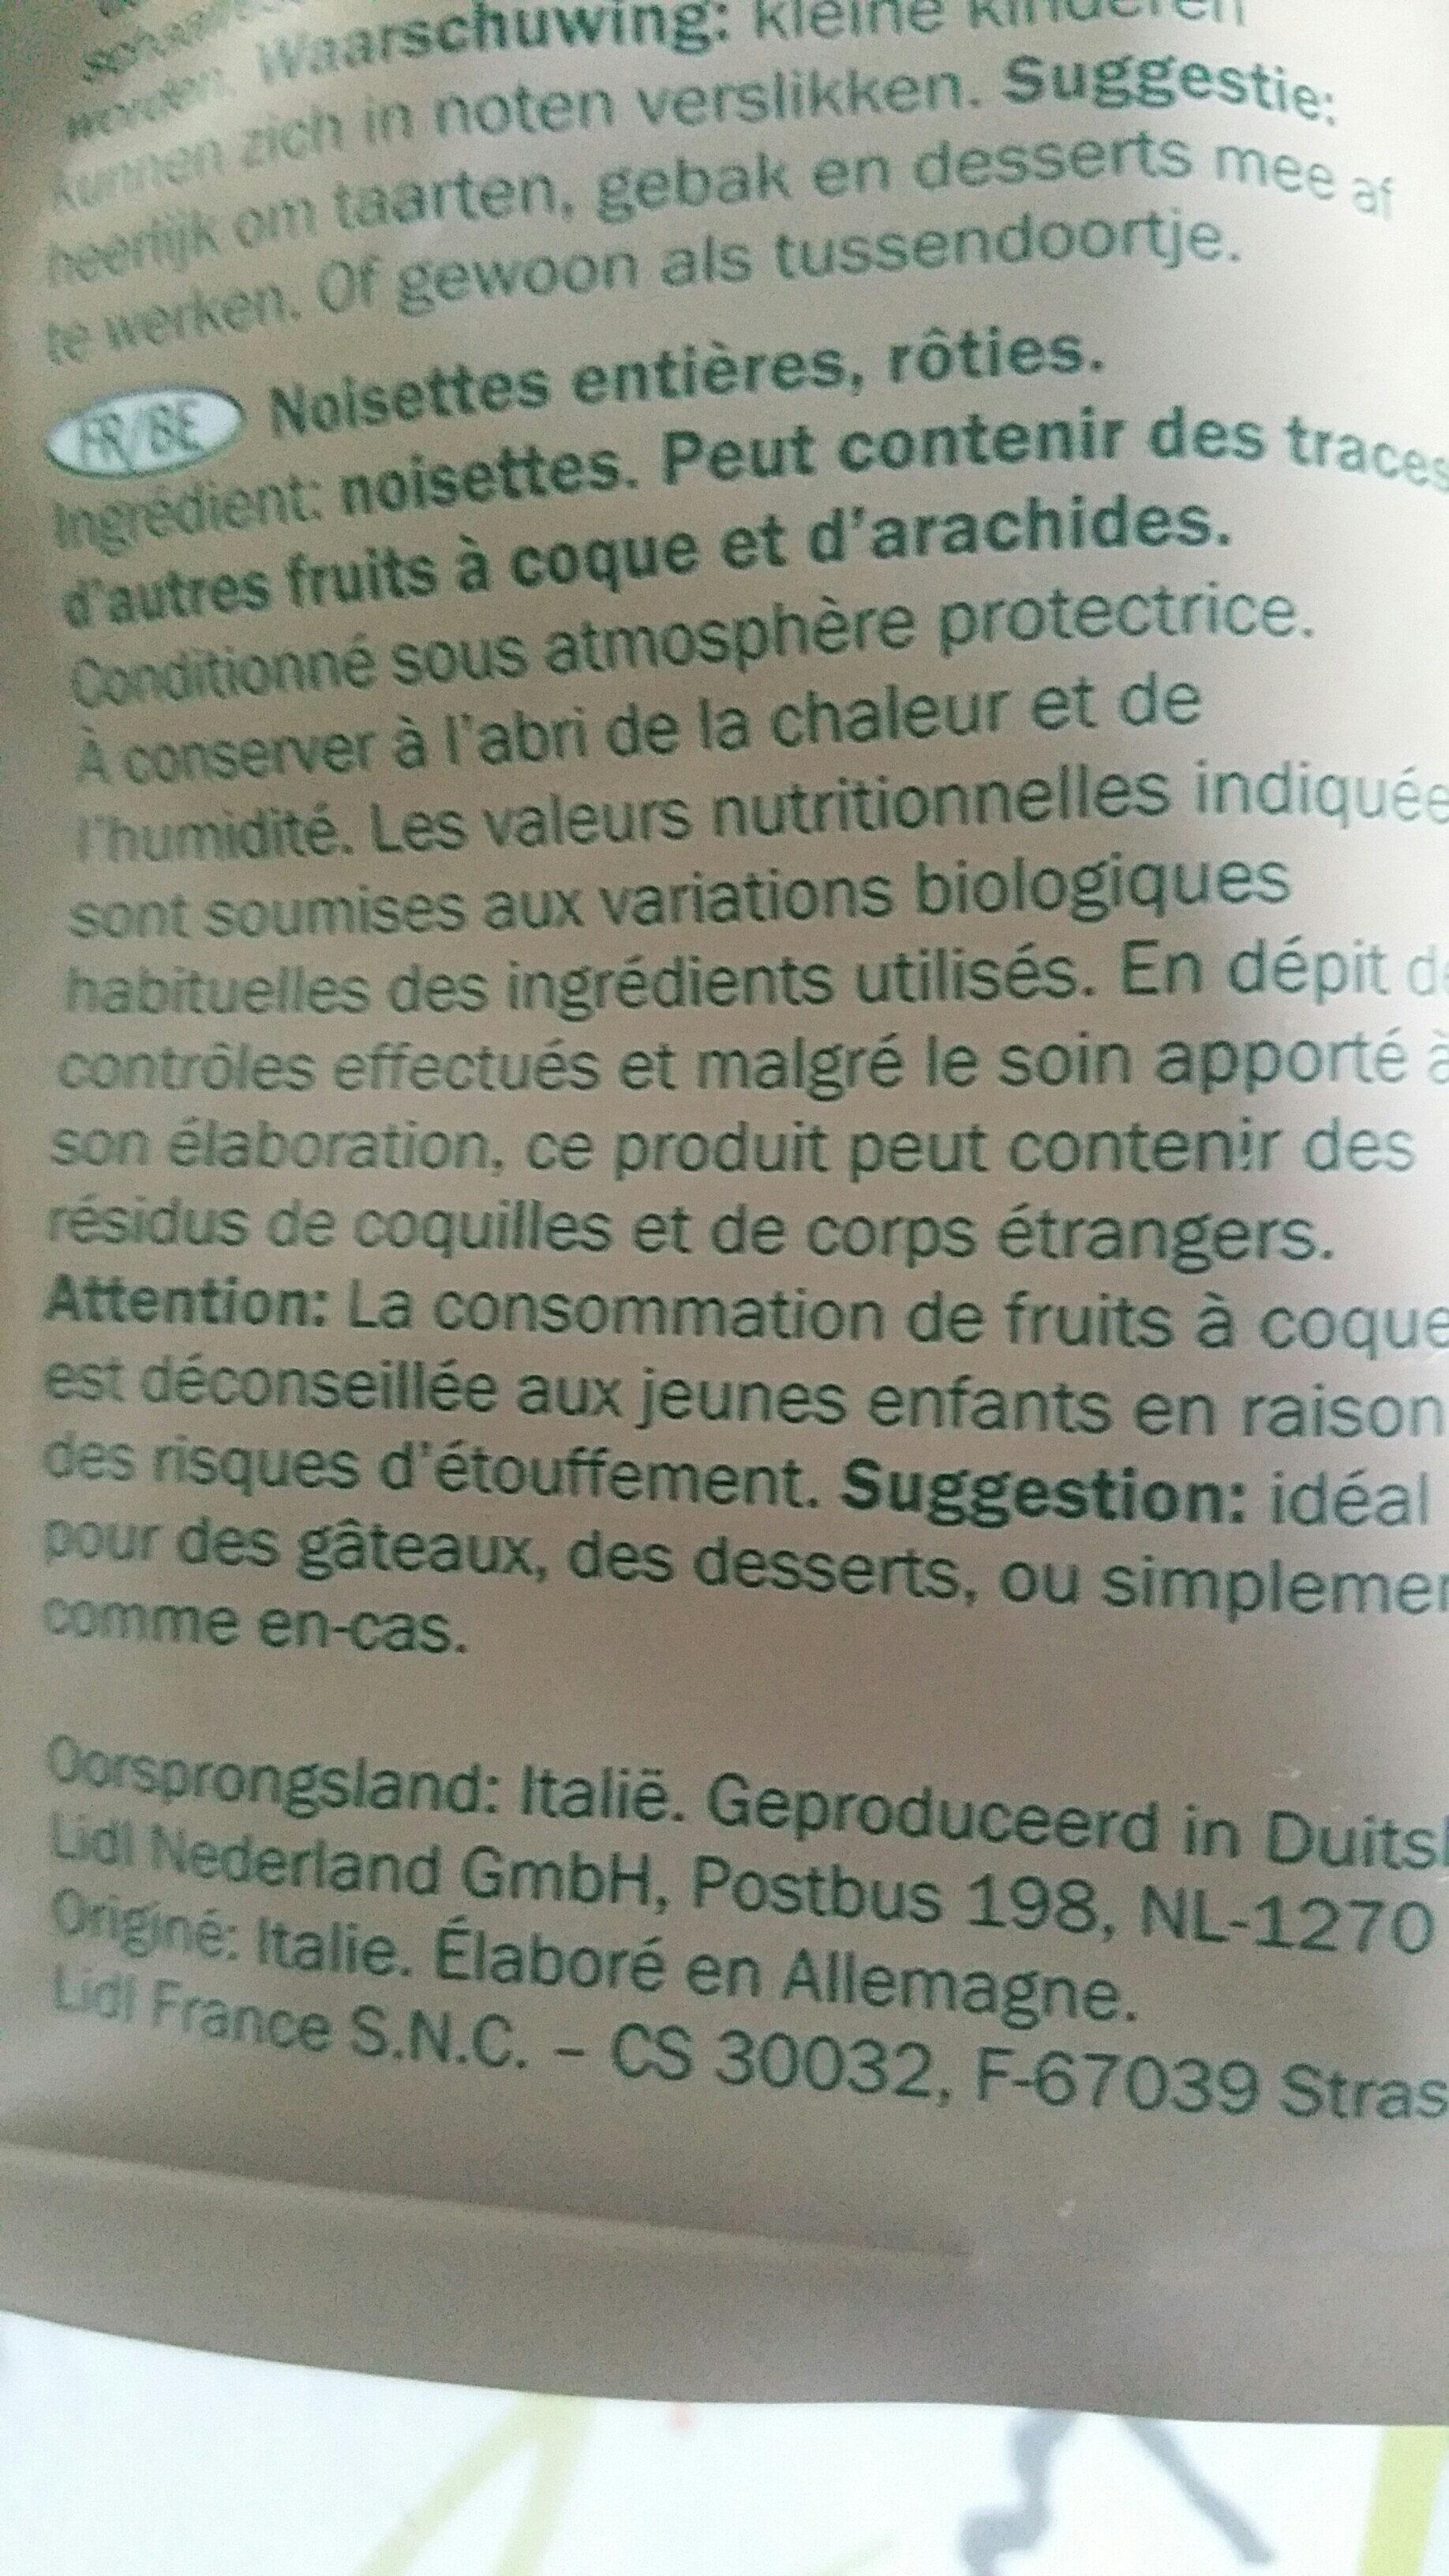 Noisettes grillées - Ingrediënten - fr